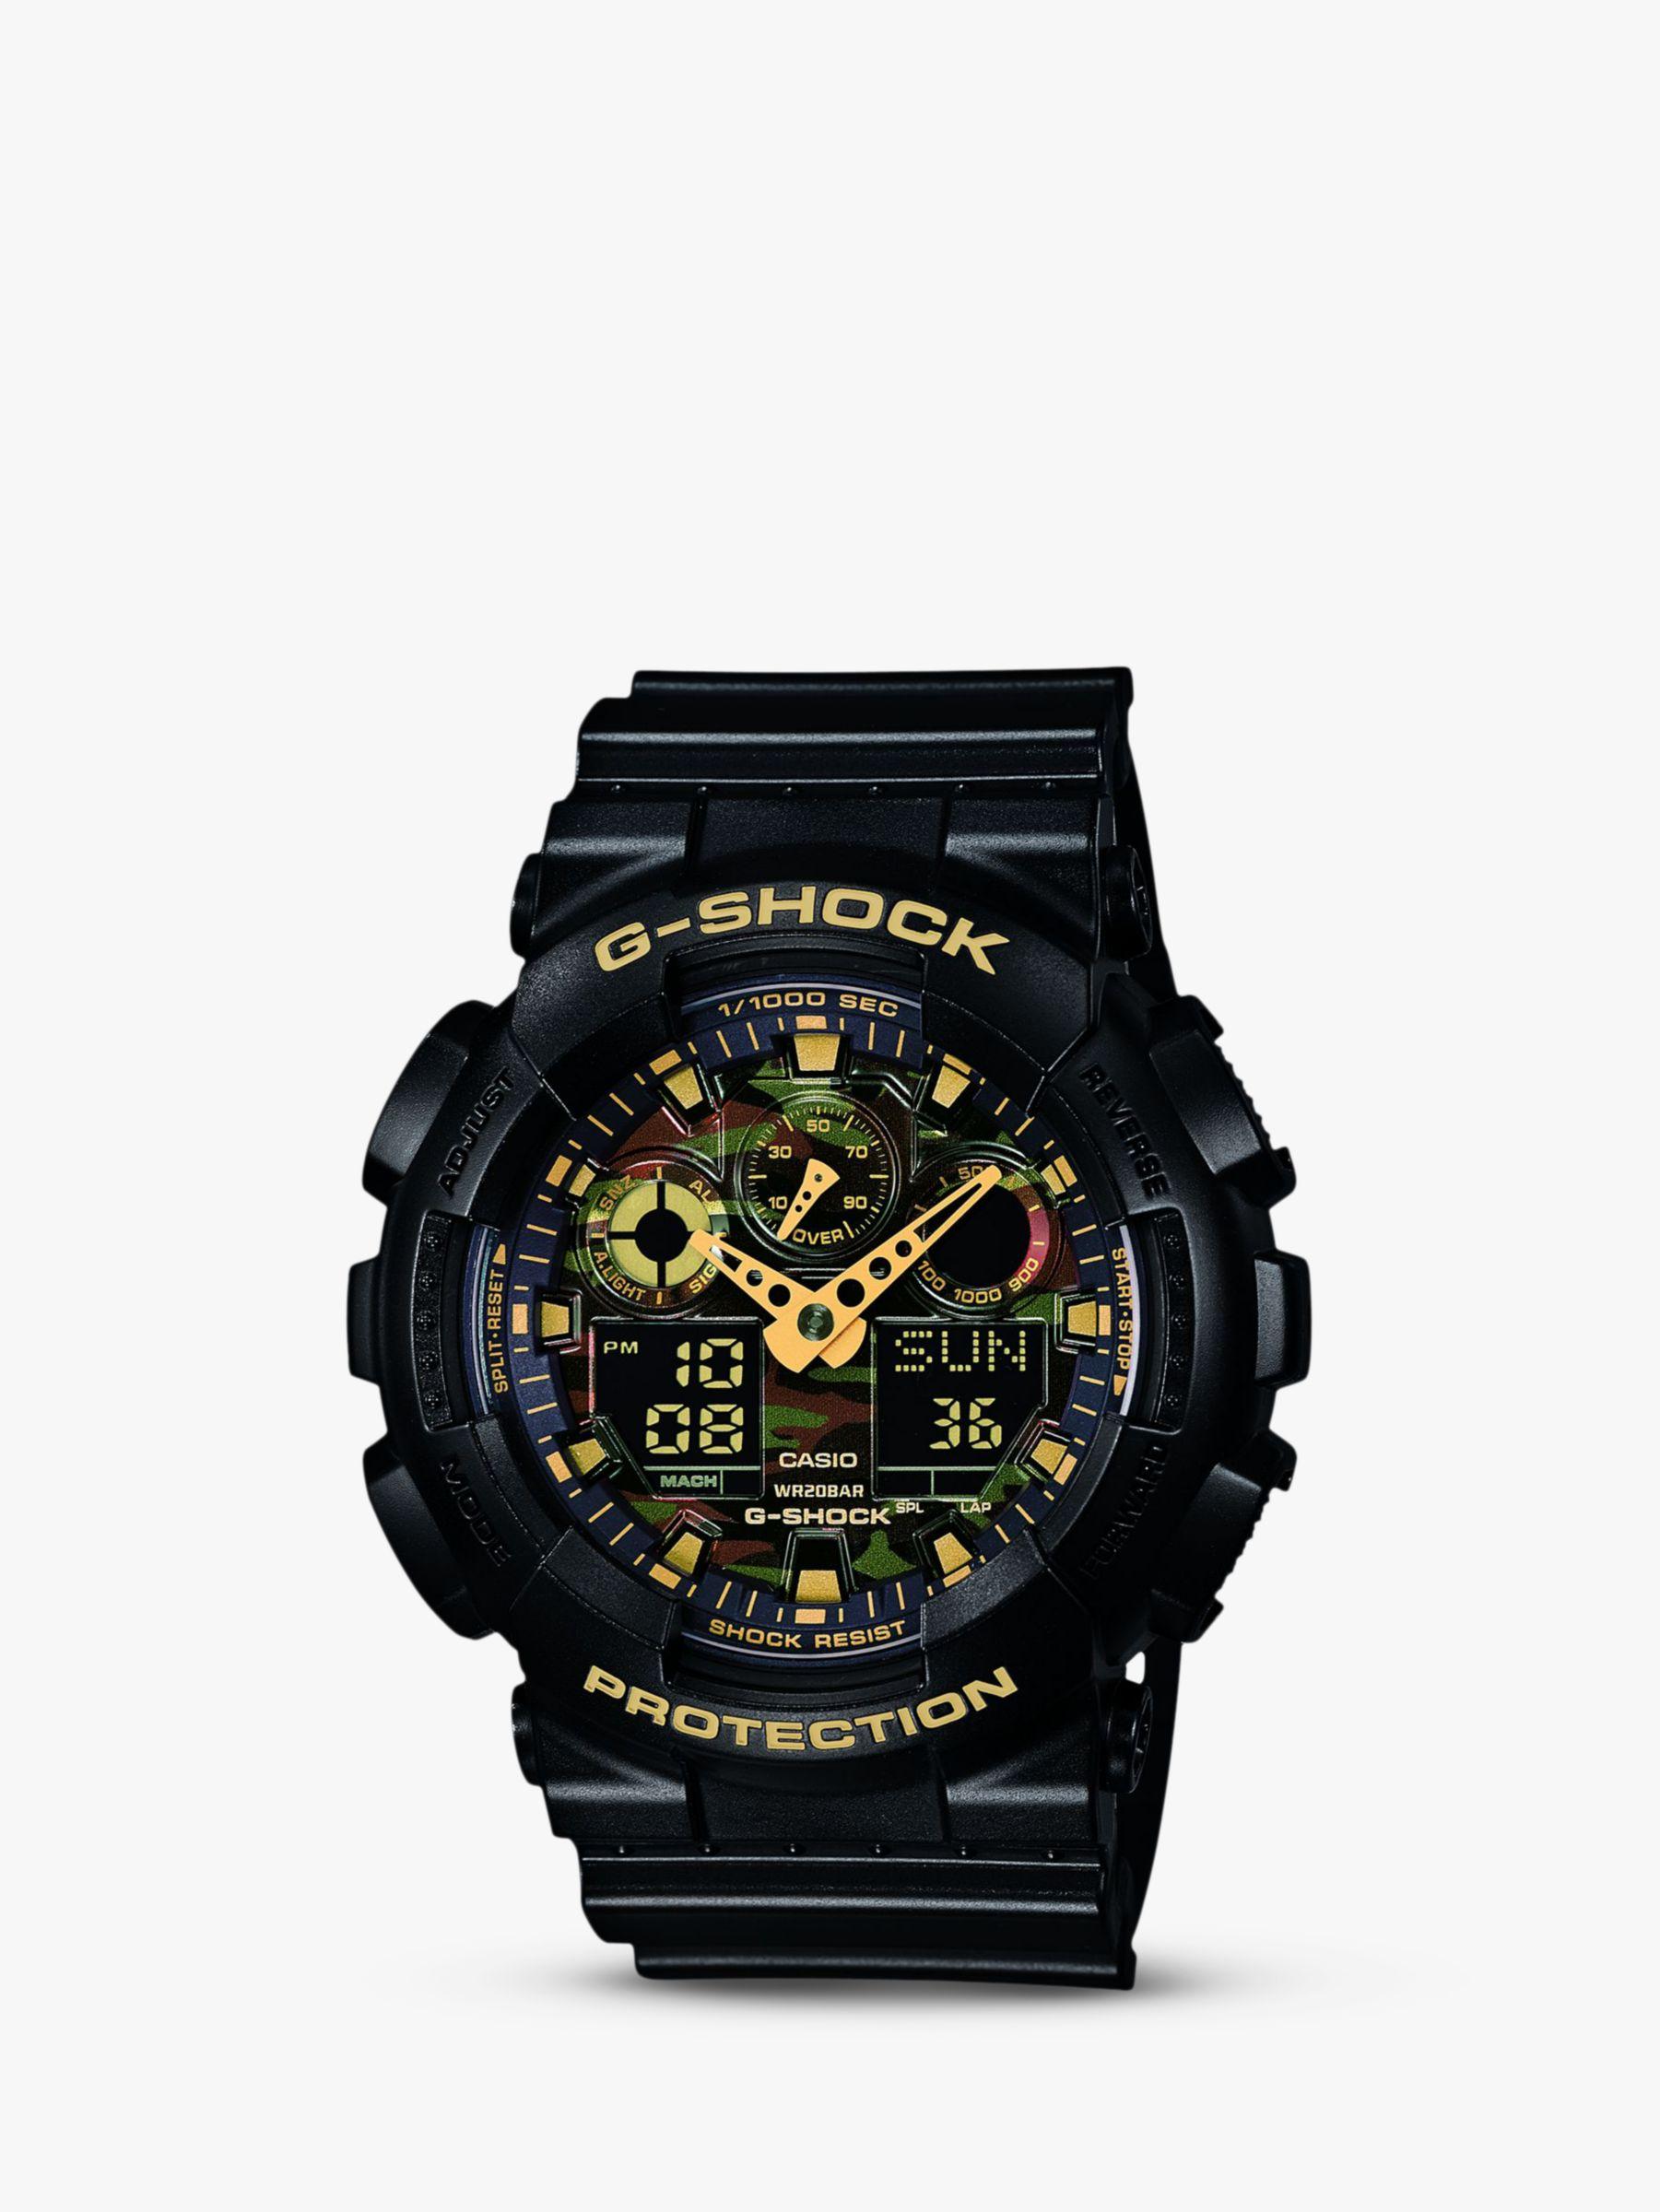 Casio Casio GA-100CF-1A9ER Men's G-Shock Alarm Chronograph Resin Strap Watch, Black/Amber